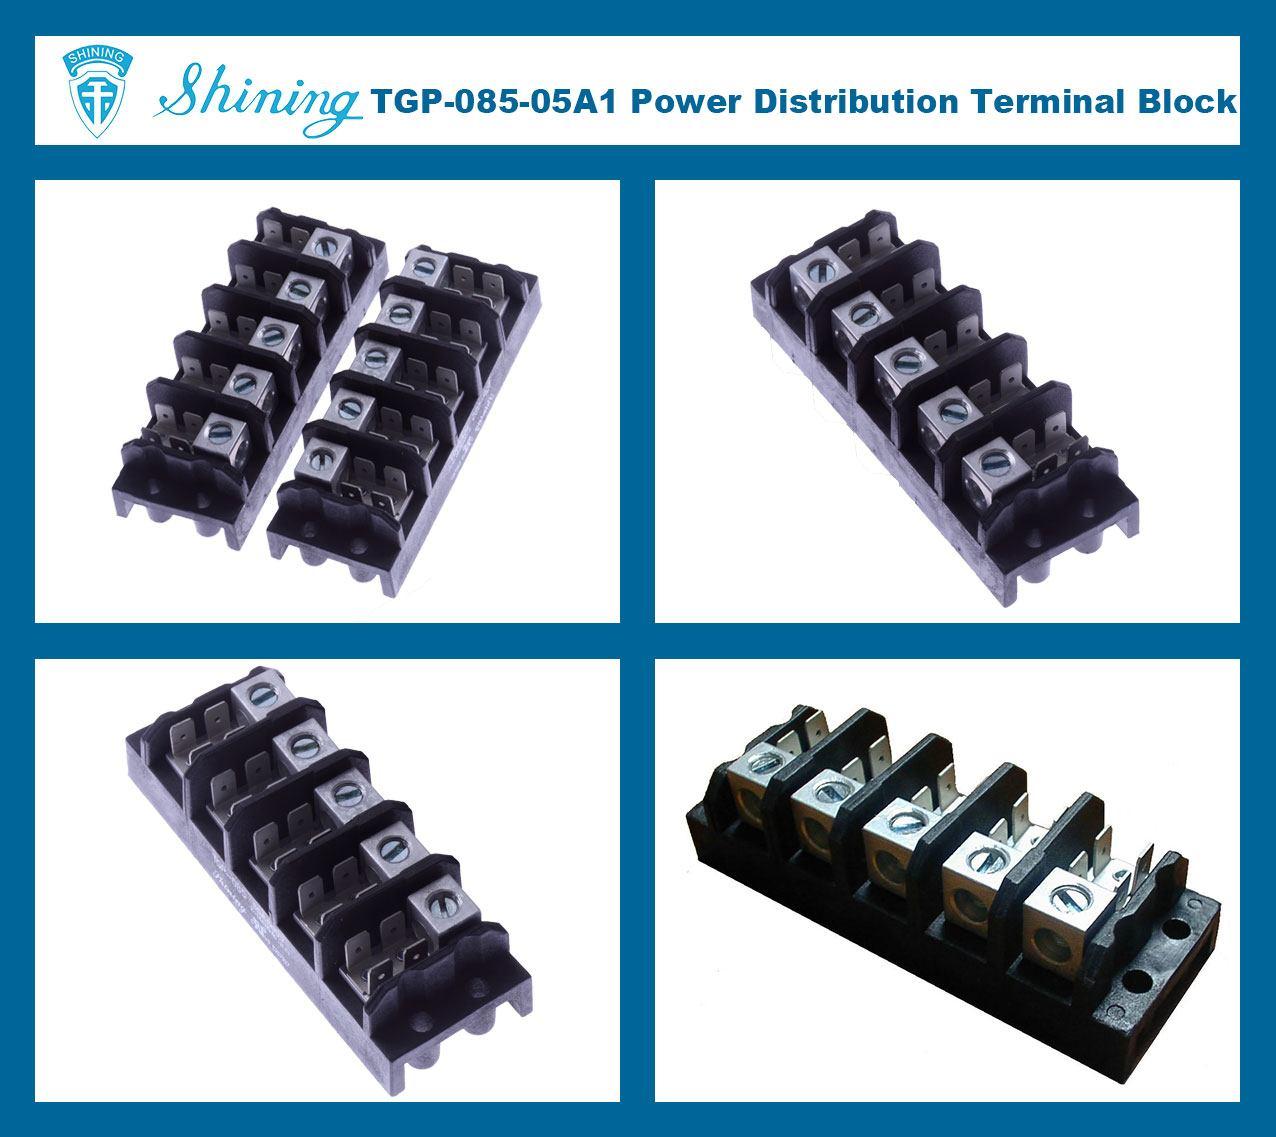 TGP-085-05A1 600V 85A 5 Pole Electrical Power Terminal Block